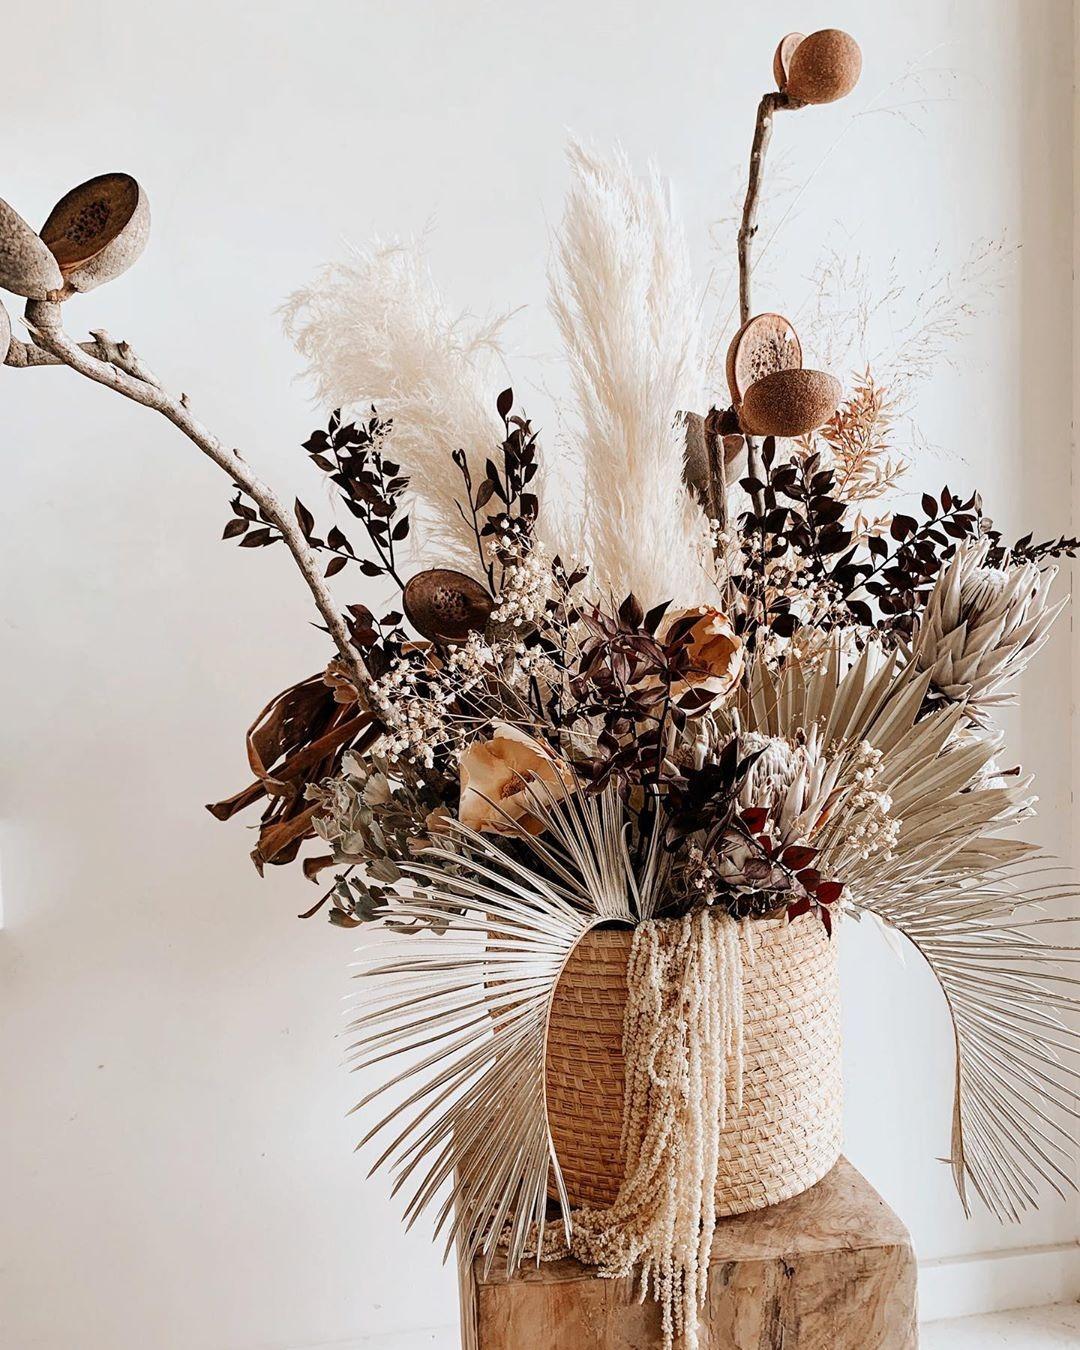 boho style dried flower arrangement sitting sitting in a vase